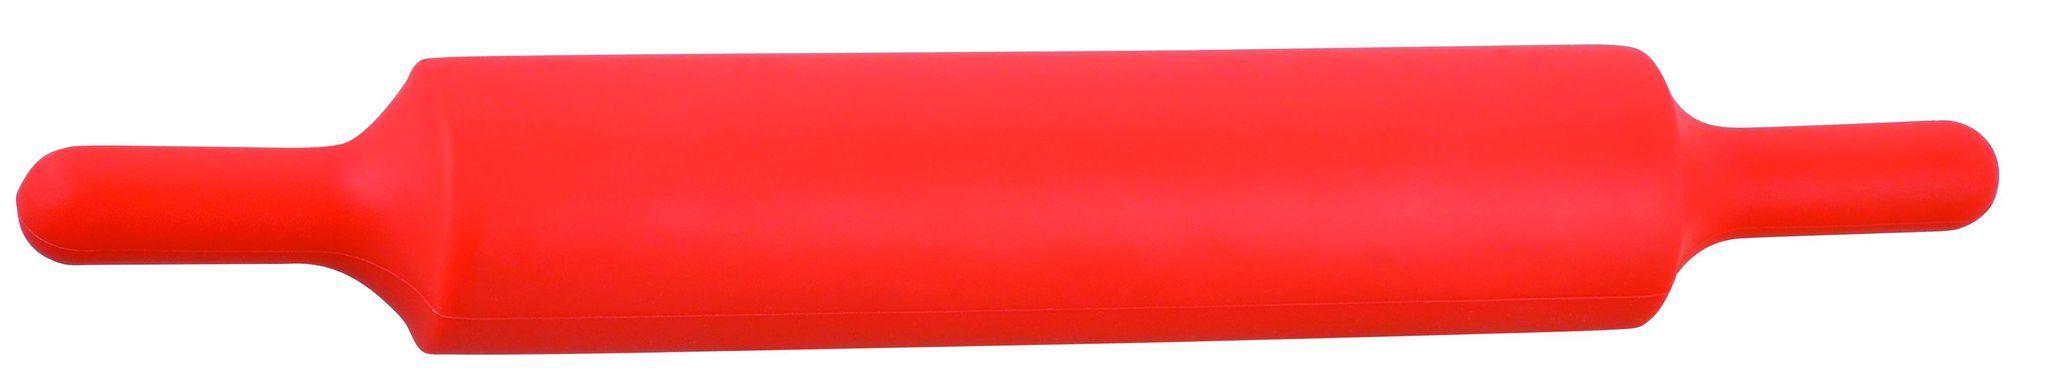 Скалка Regent inoxВсе для выпечки<br>Тип: скалка, Материал: силикон, Размер противня: 310x45мм<br>